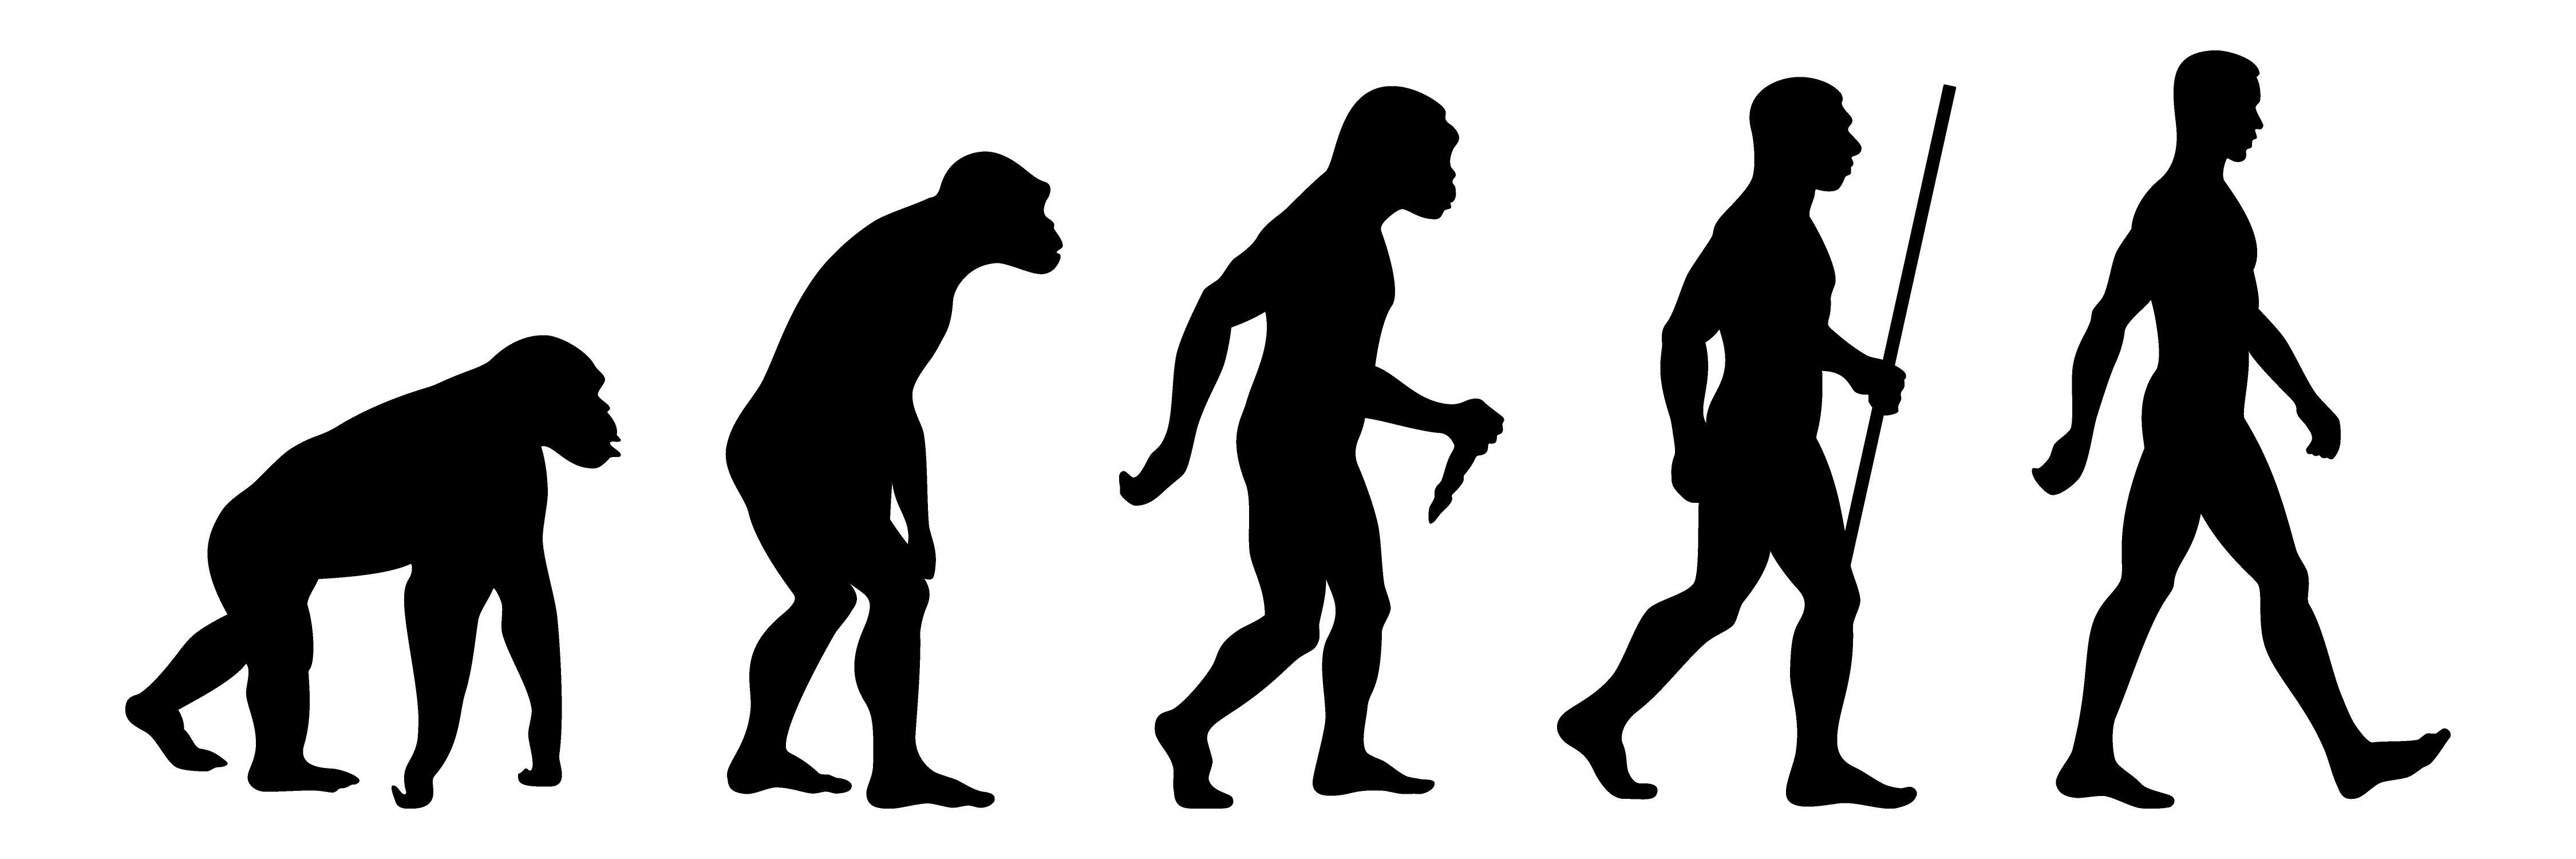 project vs process evolution